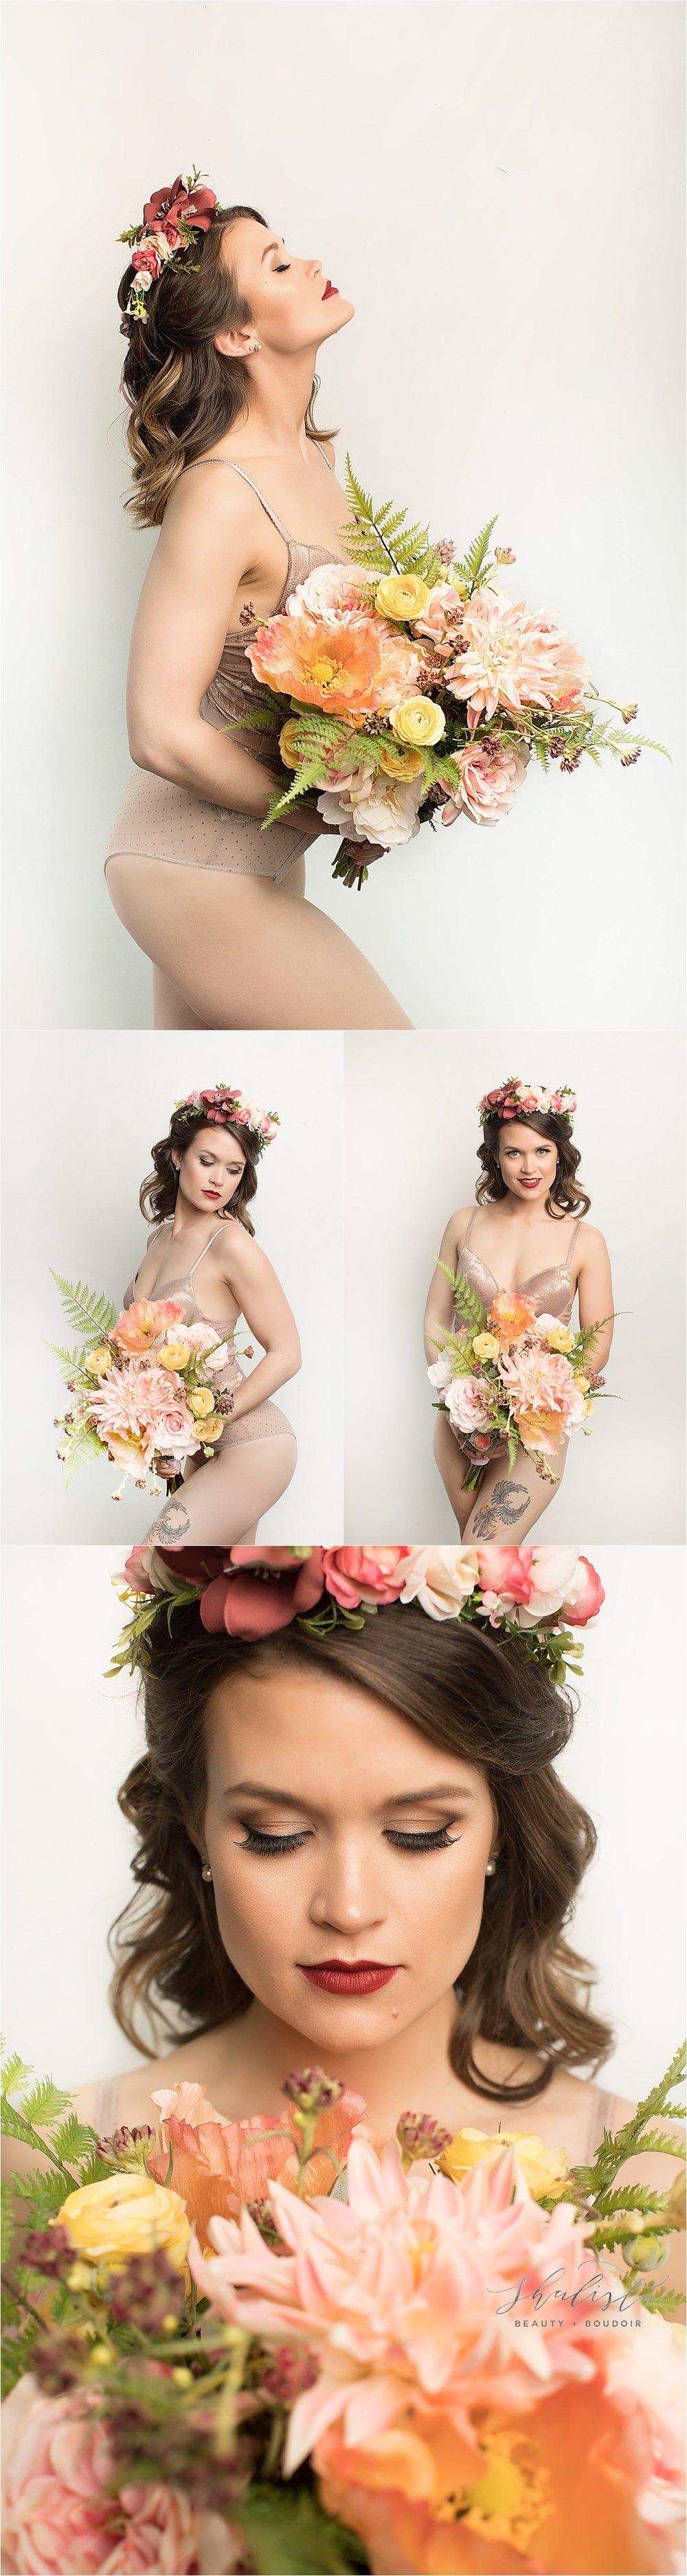 Floral vintage boudoir session